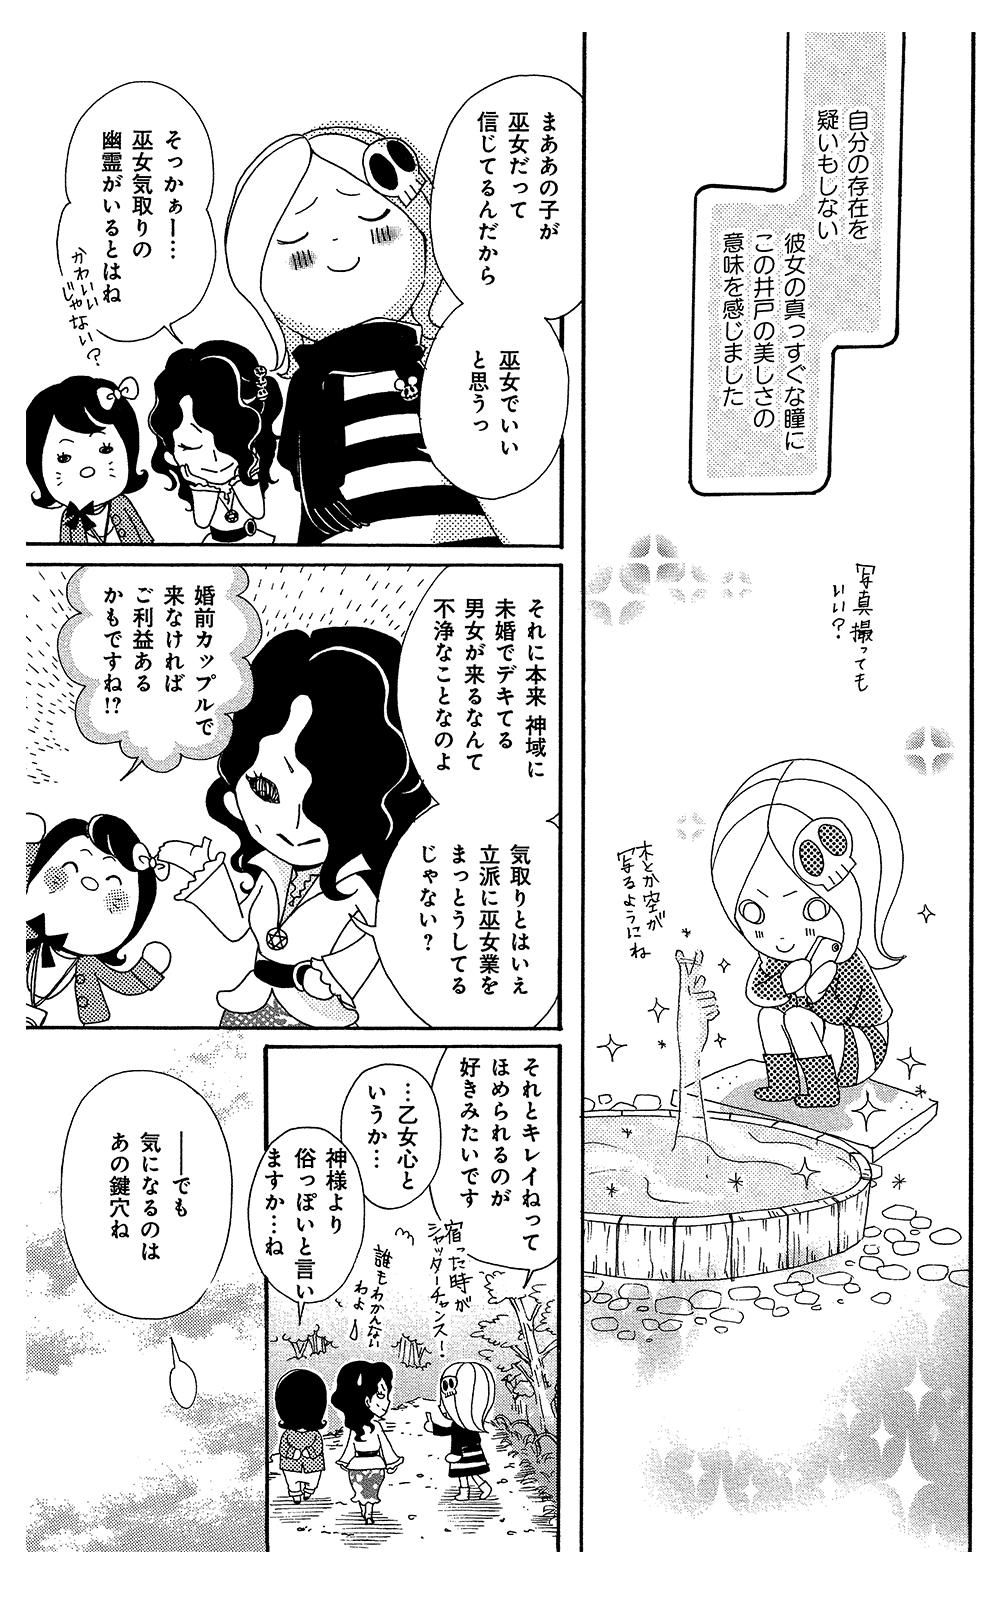 スピ☆散歩 第2話「清正井と明治神宮」②spsanp04-02.jpg